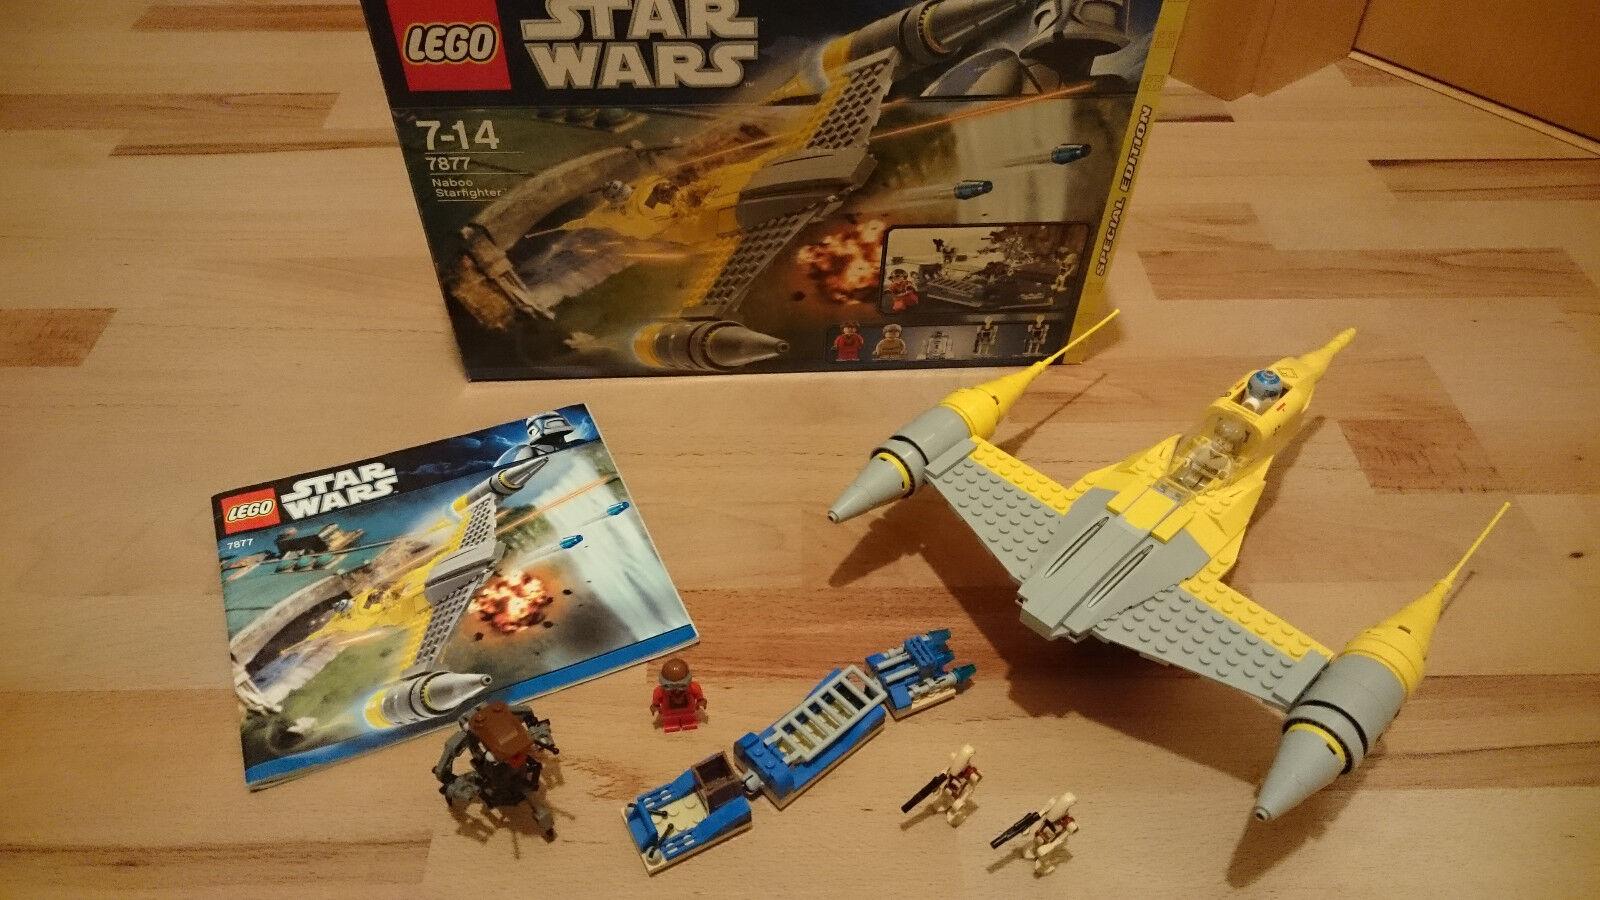 LEGO StarWars StarWars StarWars Naboo Starfighter (7877) wie Neu 3cf054